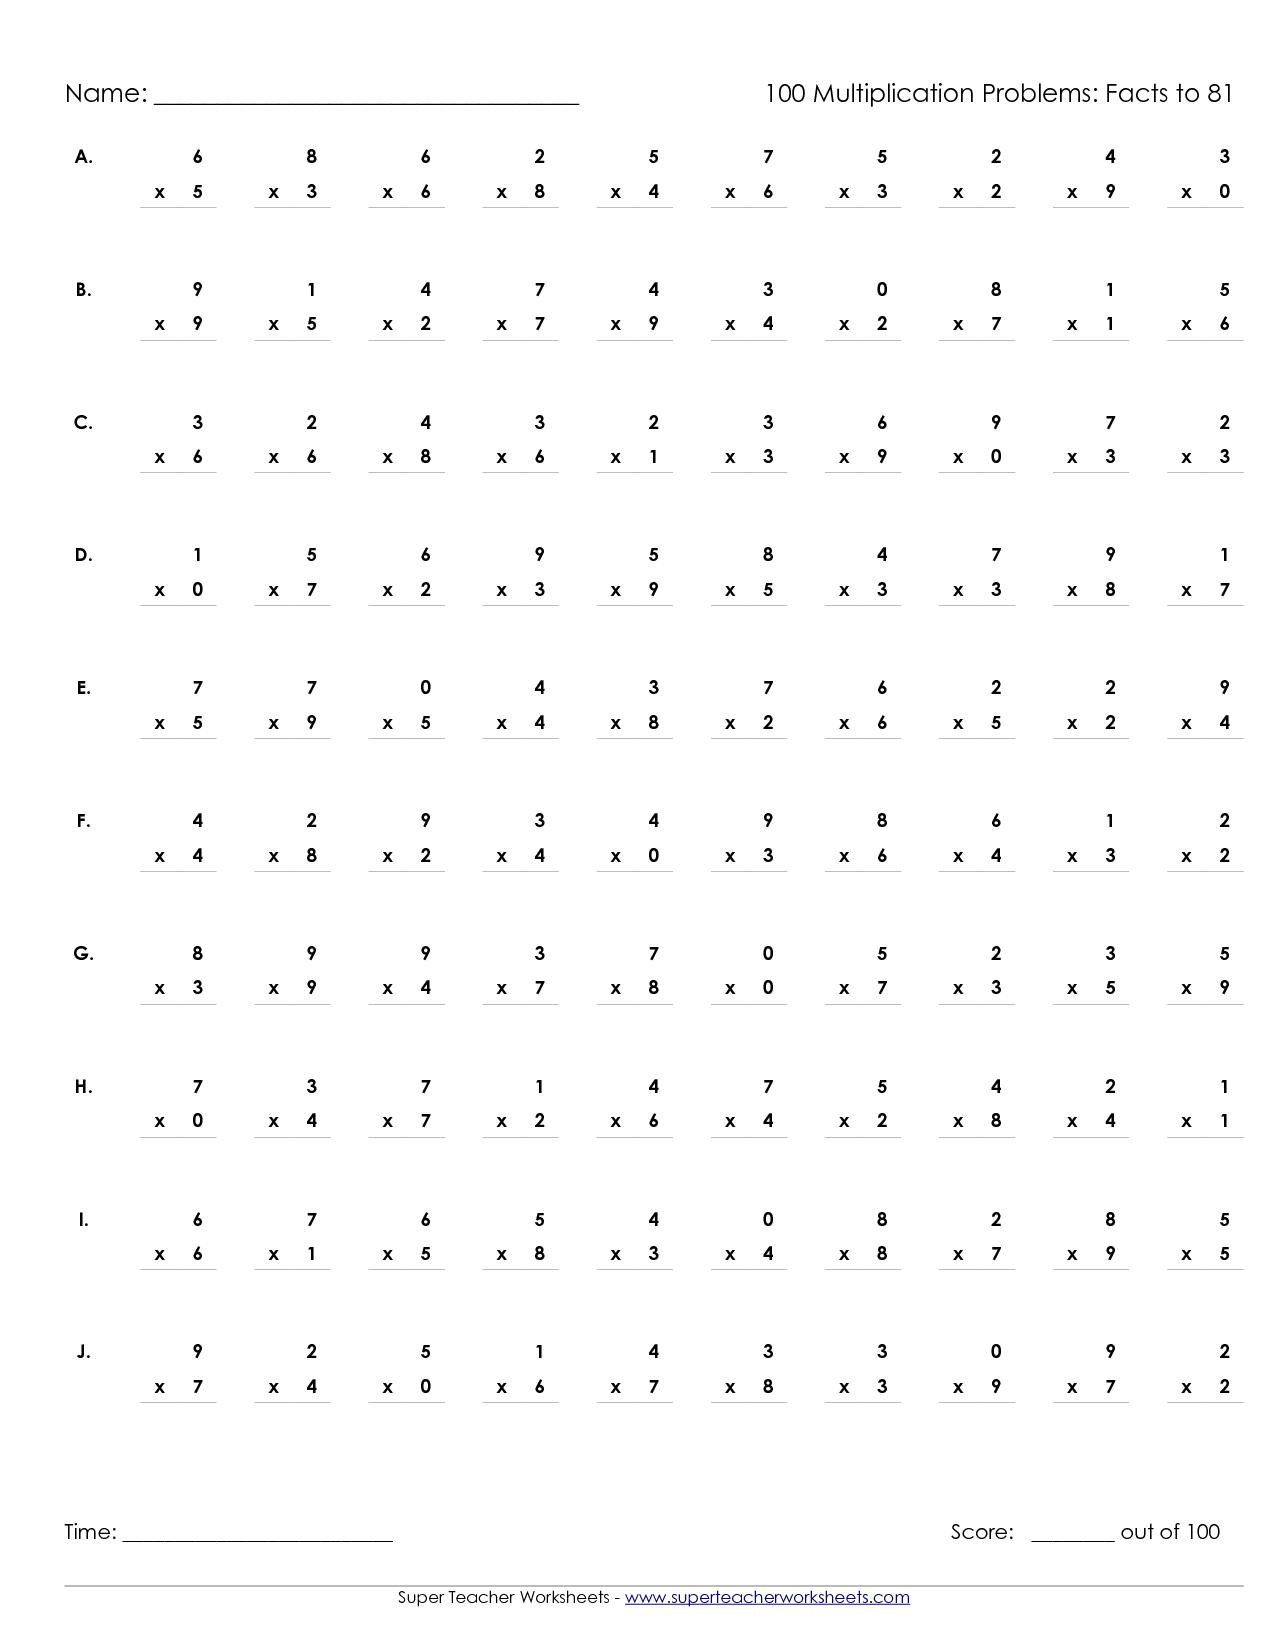 Multiplication Worksheets 100 Problems Timed Tests The Best